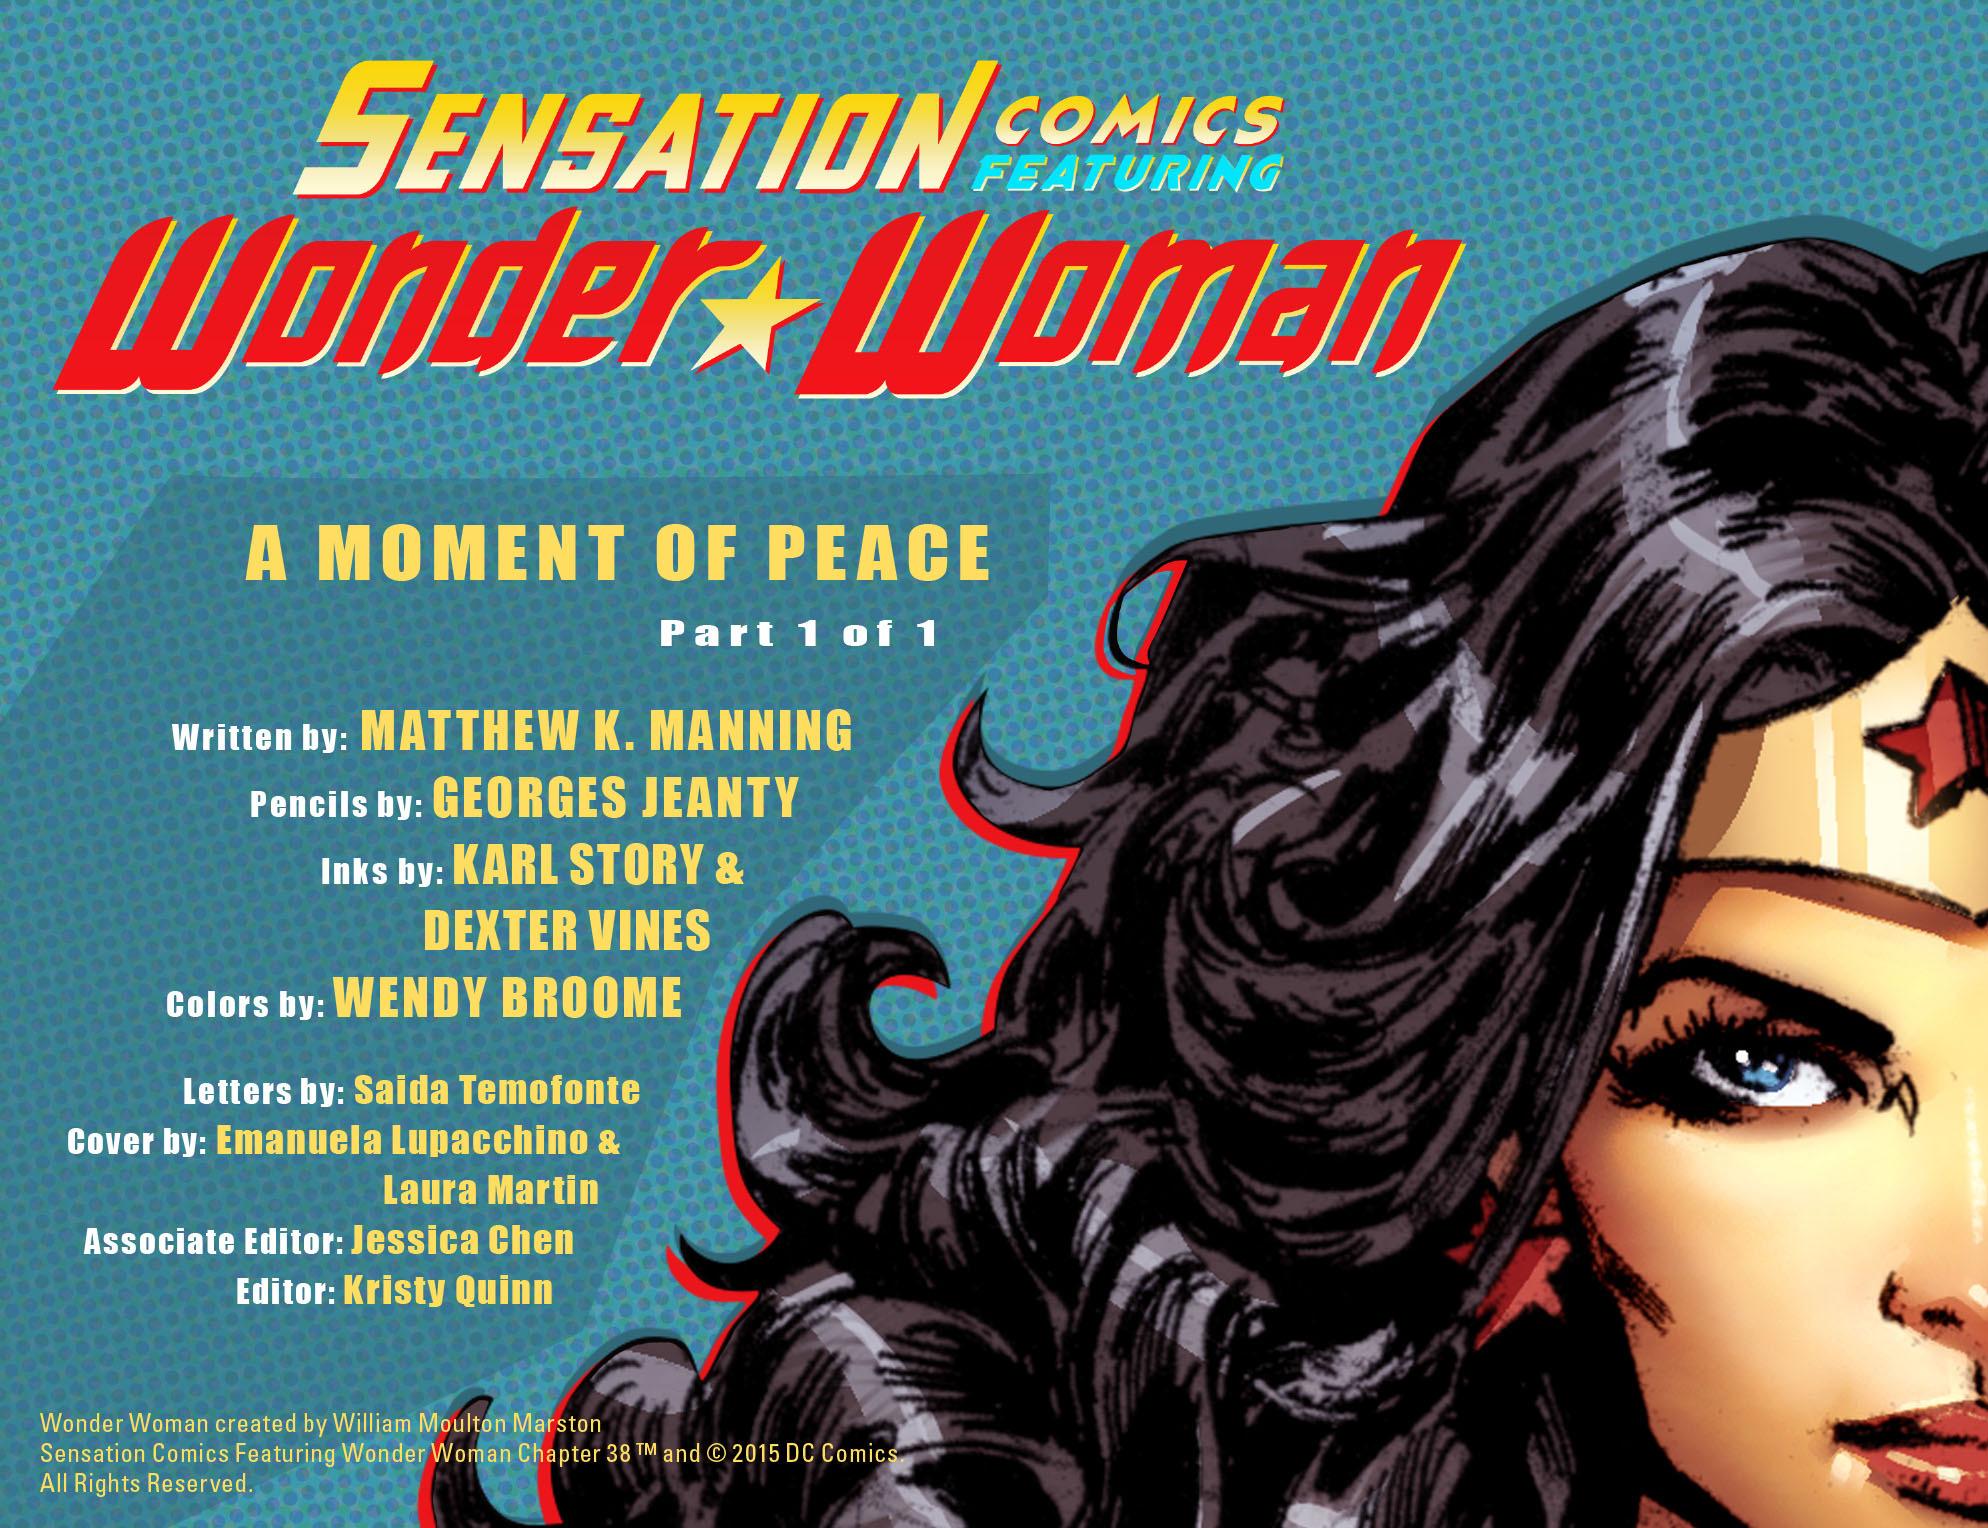 Read online Sensation Comics Featuring Wonder Woman comic -  Issue #38 - 2